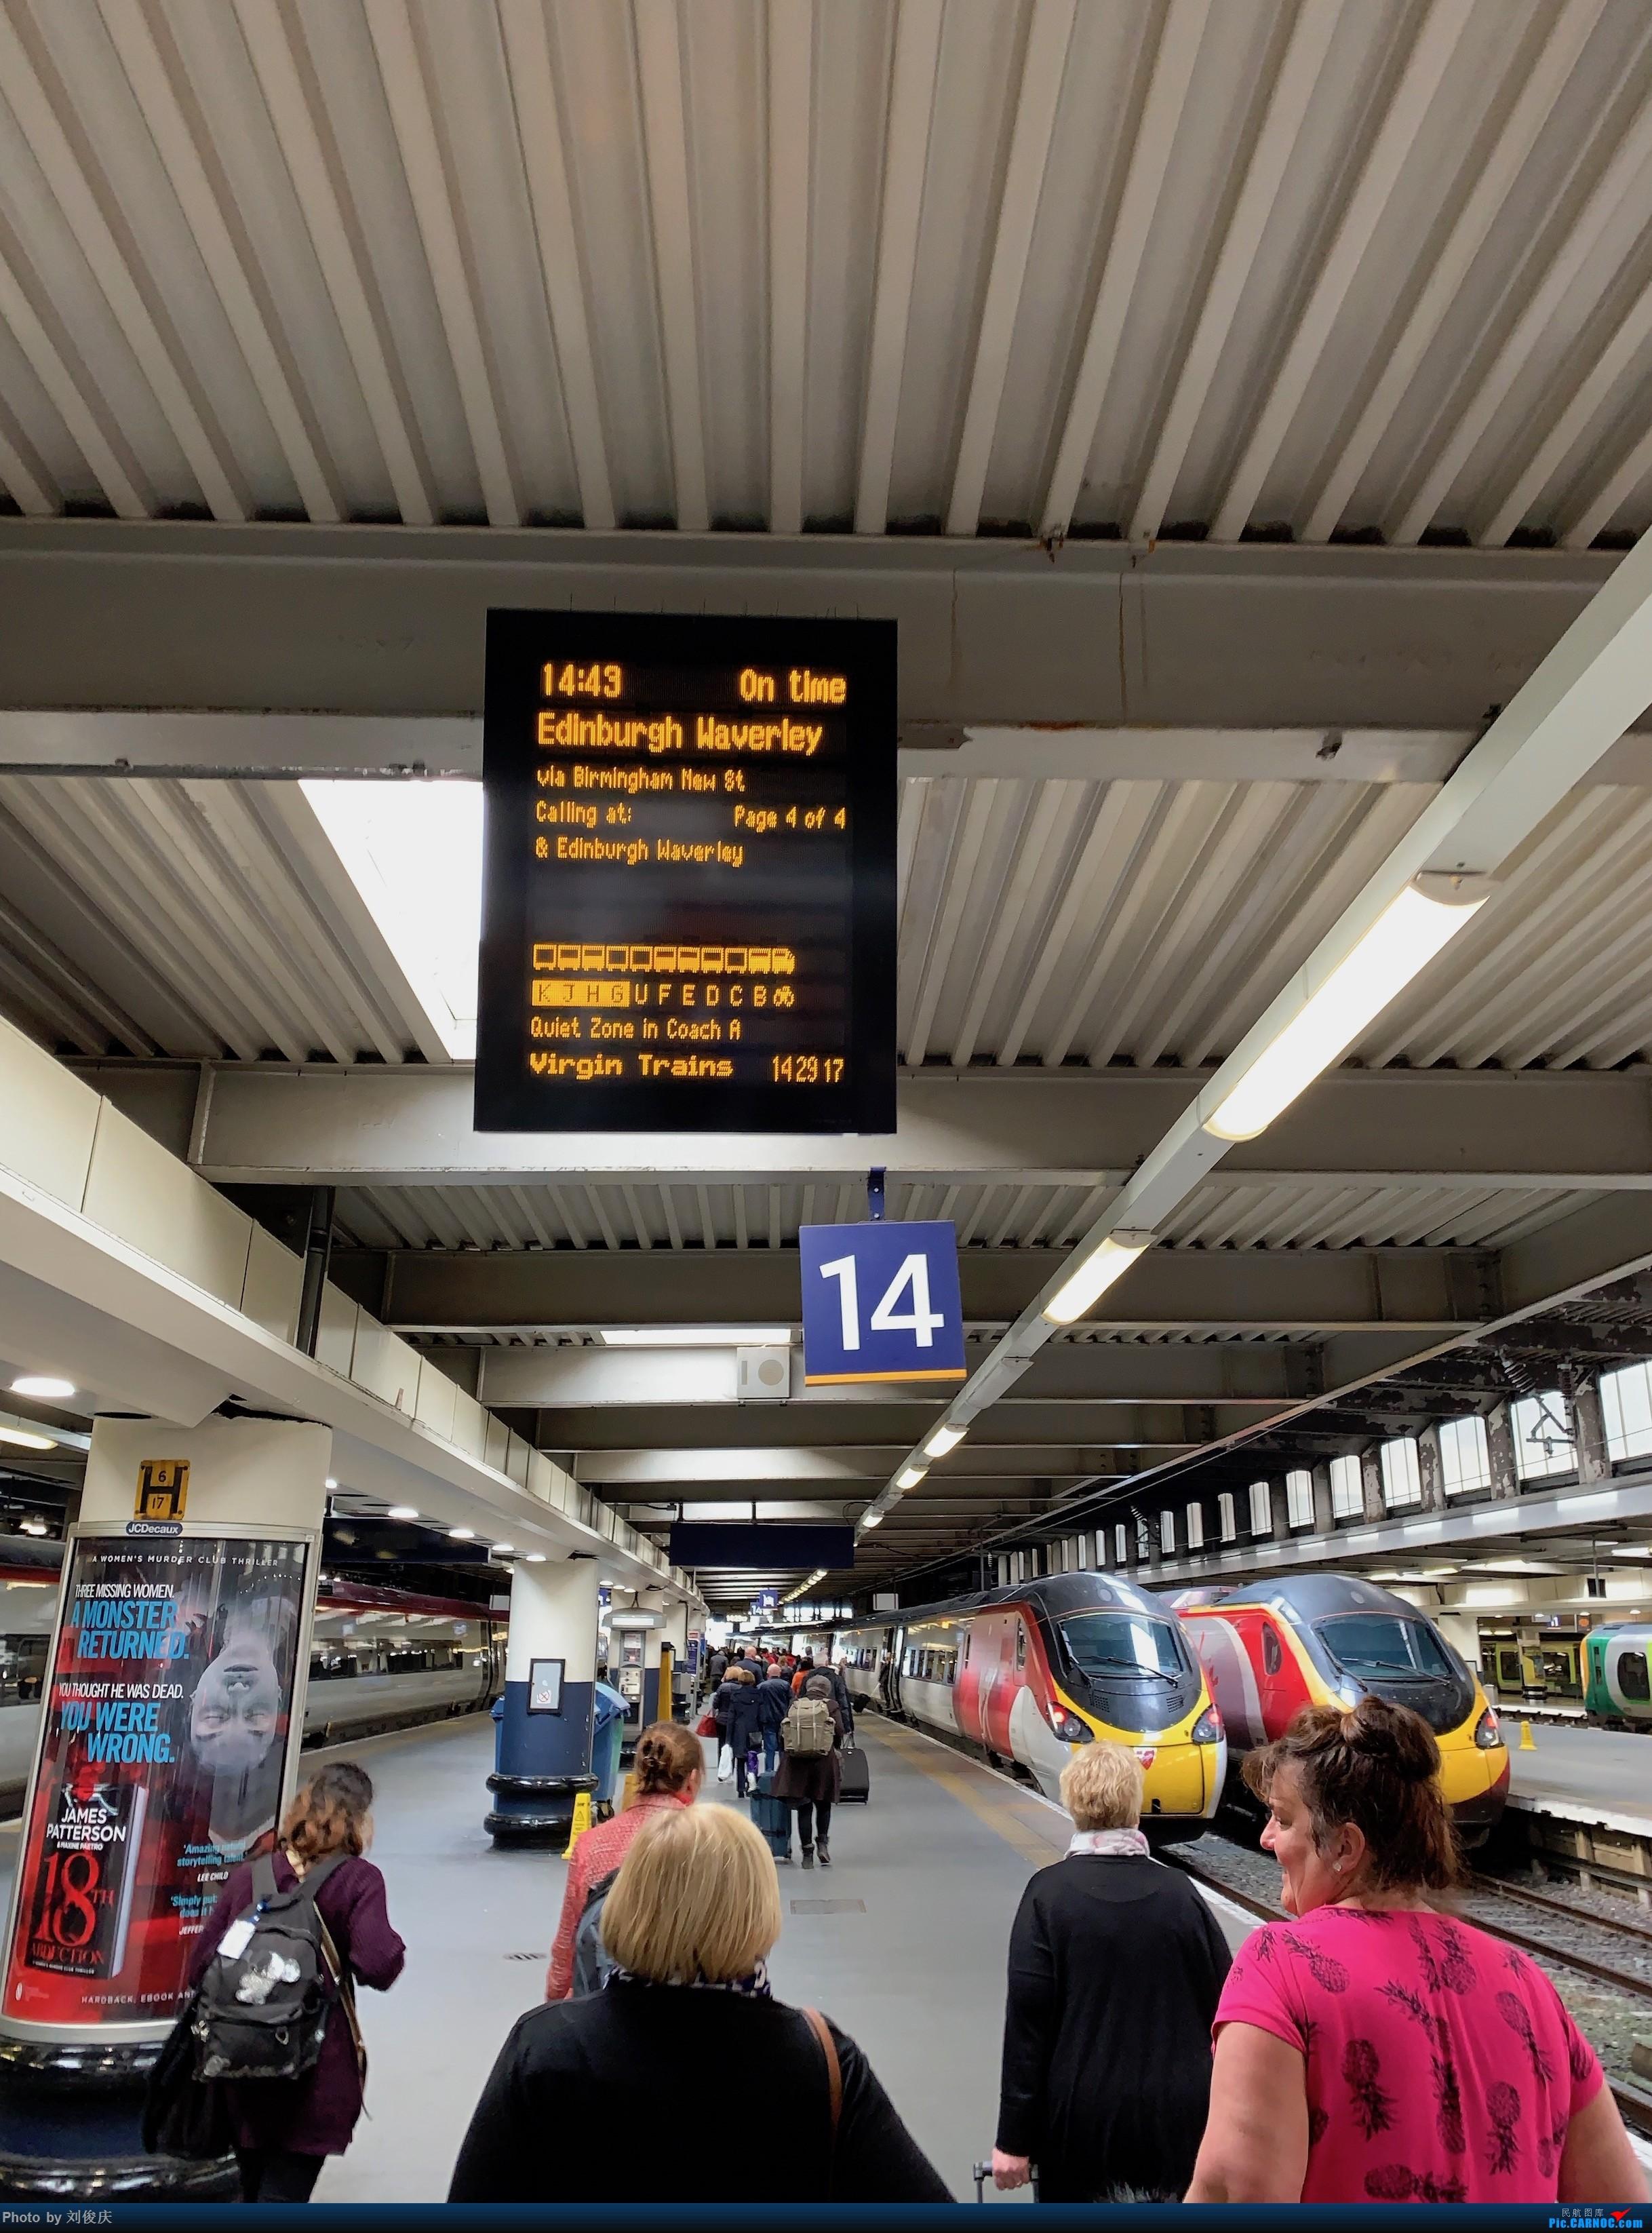 Re:[原创]SEA-JFK-LHR-CDG-FCO-CDG-LHR-ATL-SEA 8天3国5城暴走游记 [4月11日-更新至LHR] LONDON EUSTON  London Euston